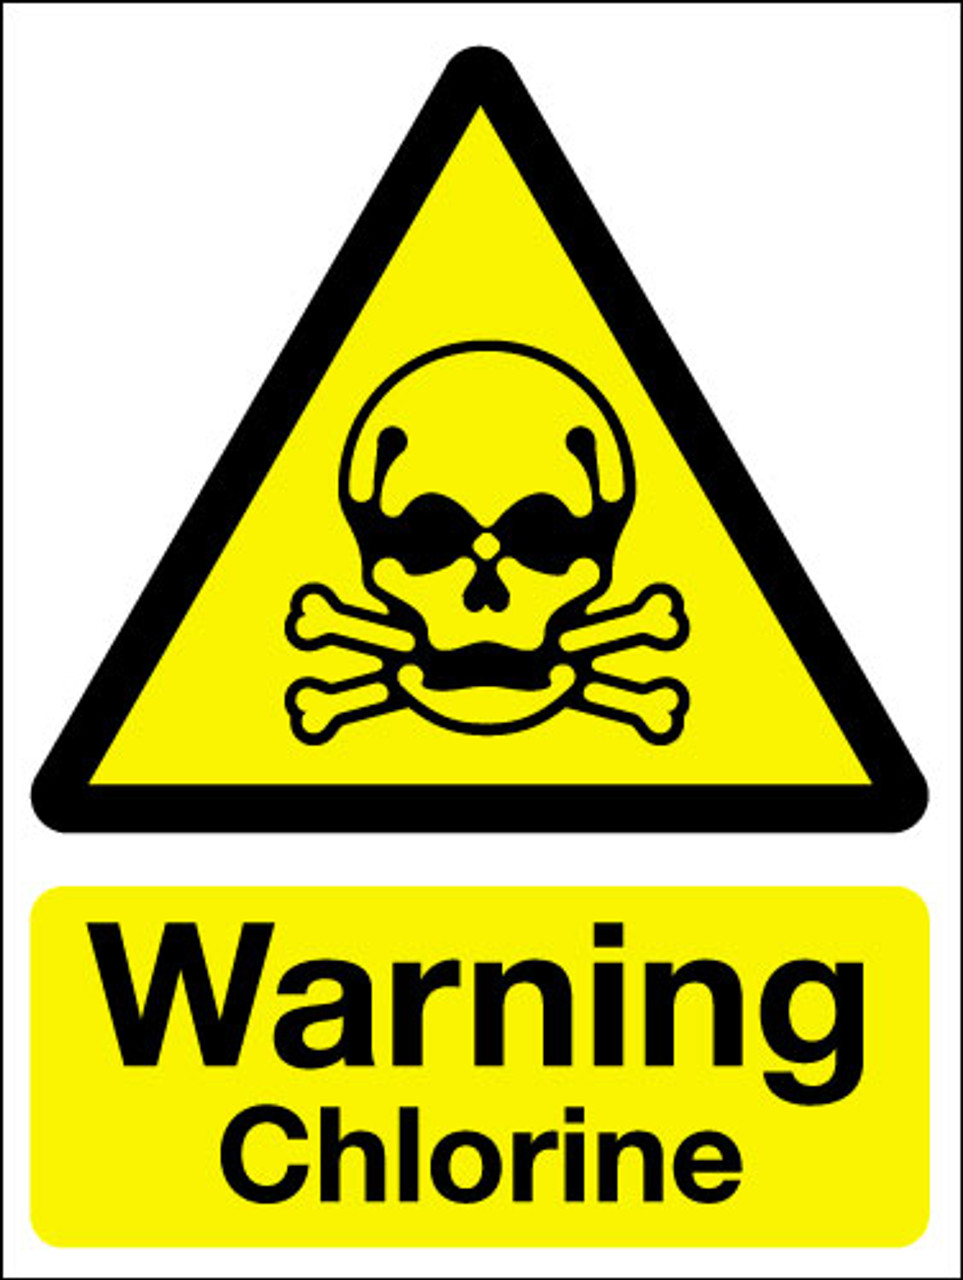 Warning chlorine sign